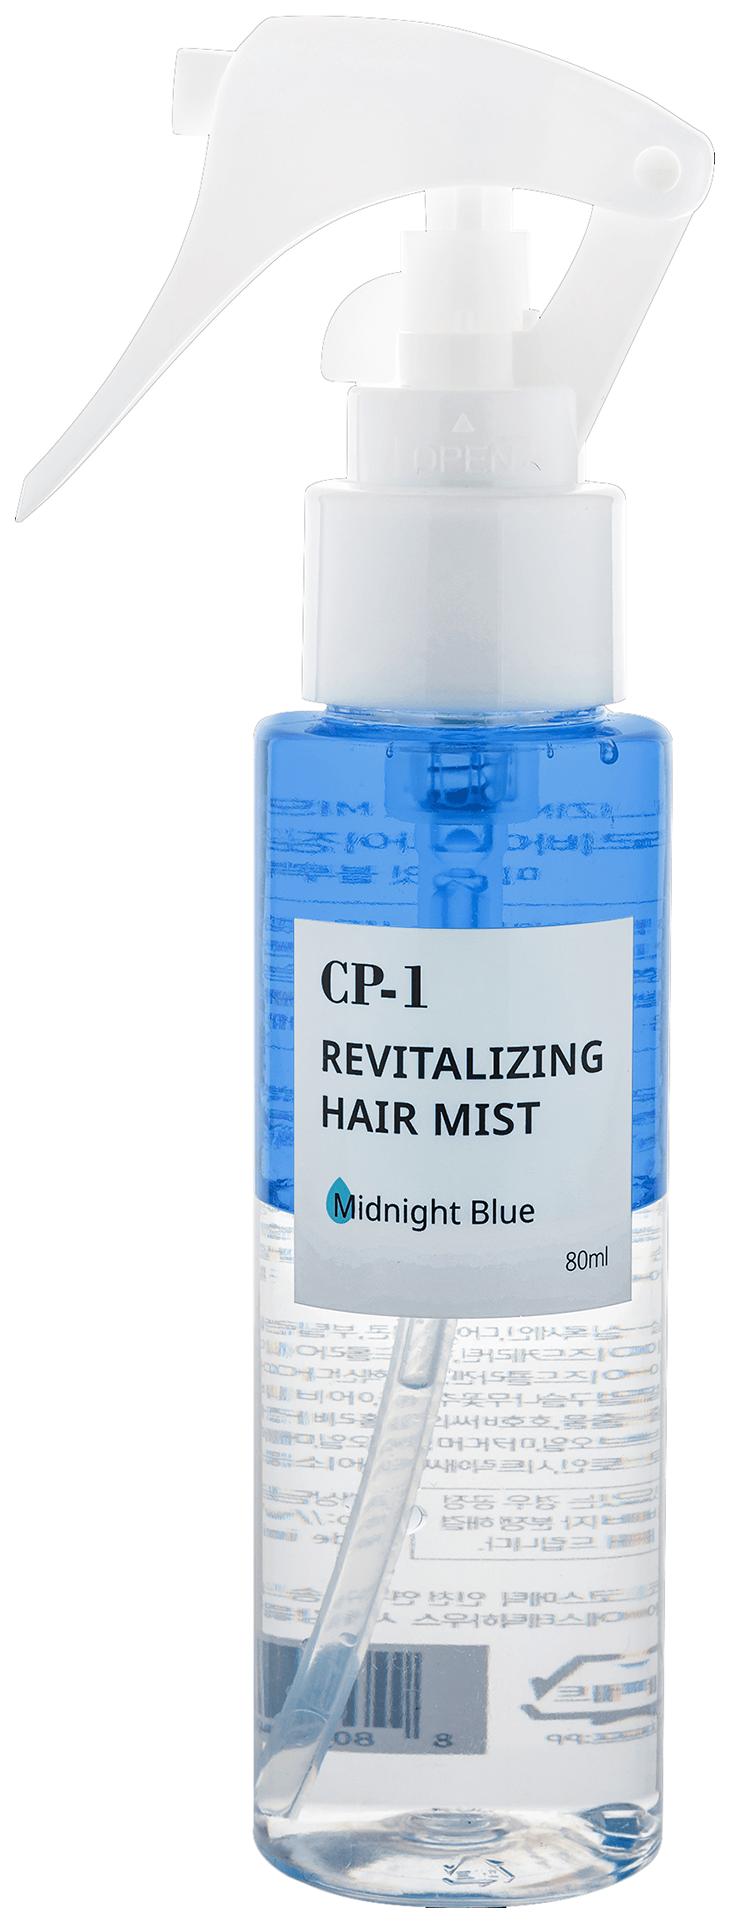 Купить Мист для волос Esthetic House CP-1 Revitalizing Hair Mist Midnight Blue 80 мл